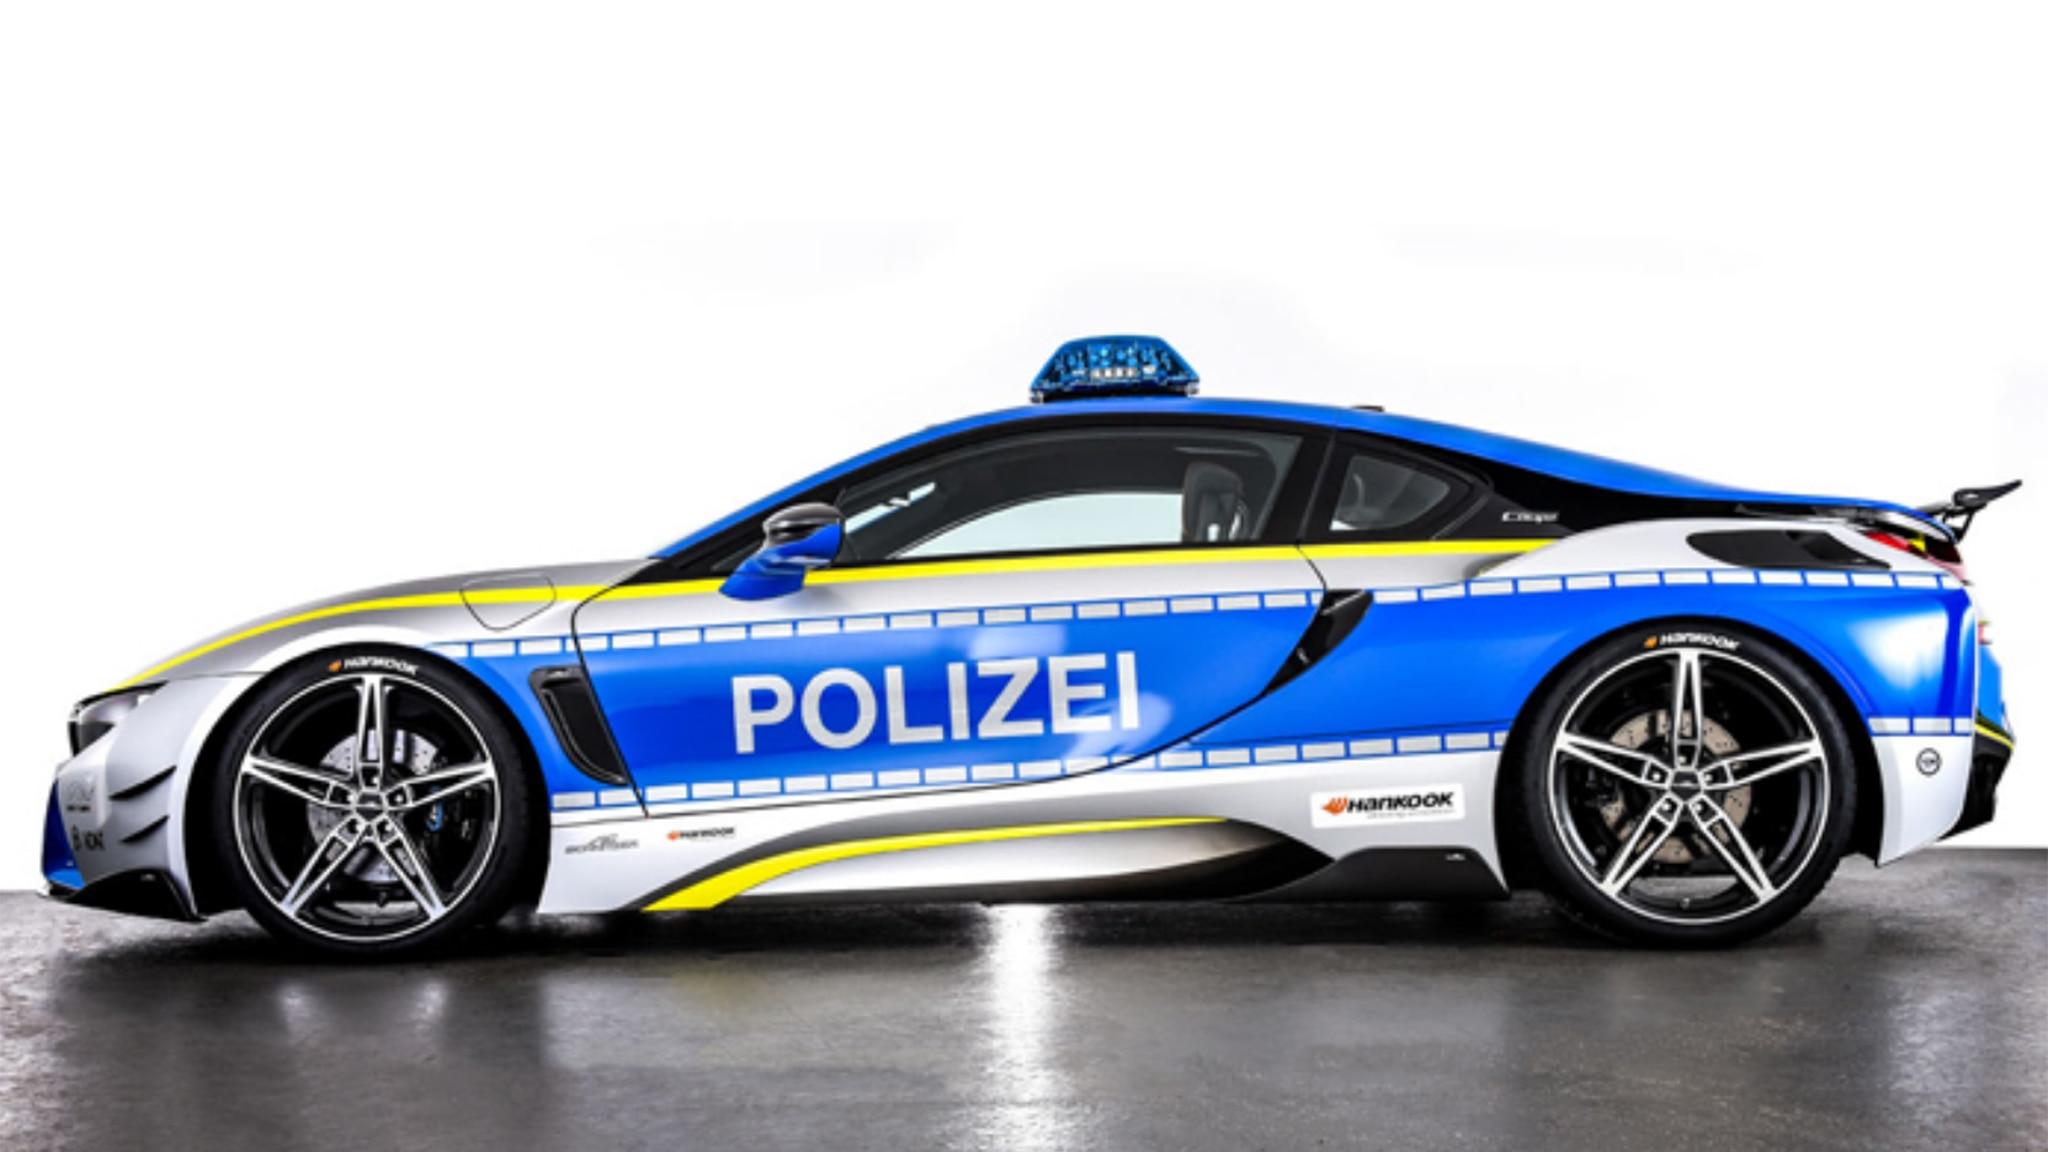 BMW I8 AC Schnitzer Police Car 06